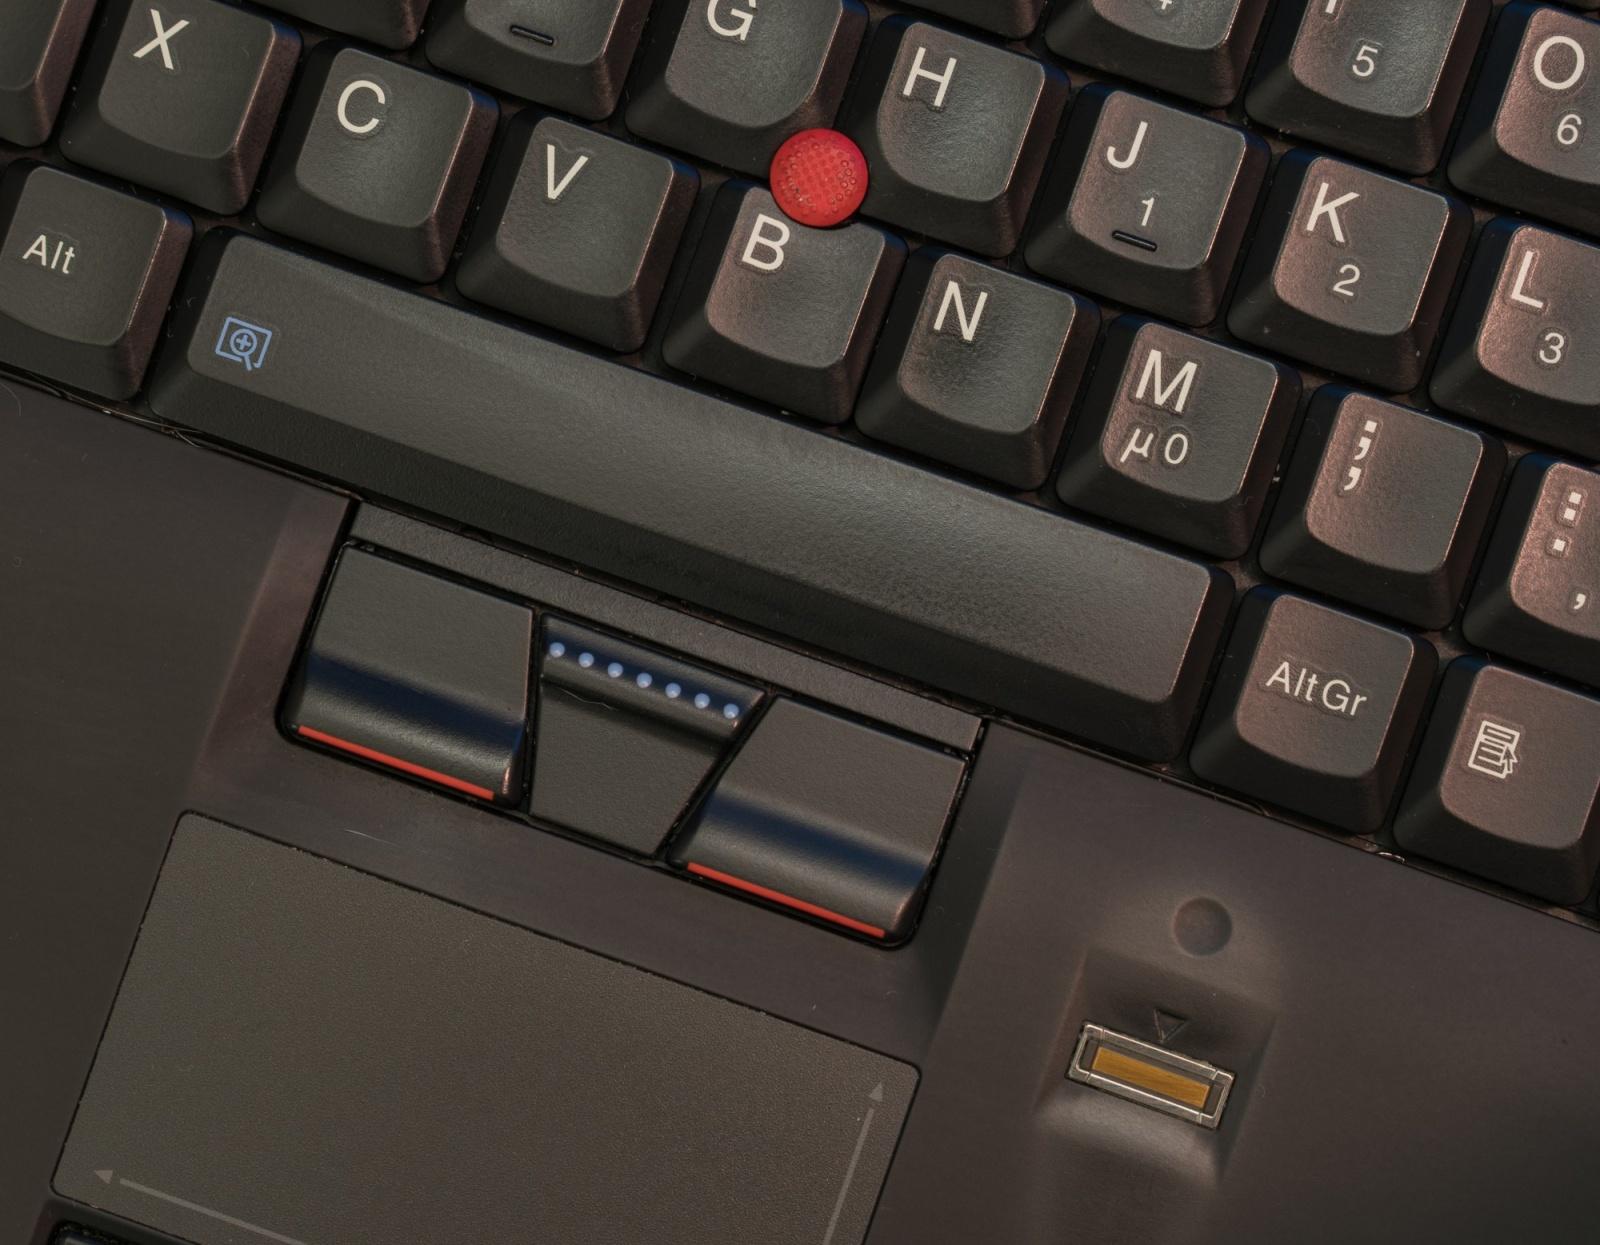 Древности: десять лет эволюции ноутбуков на примере ThinkPad X301 - 4